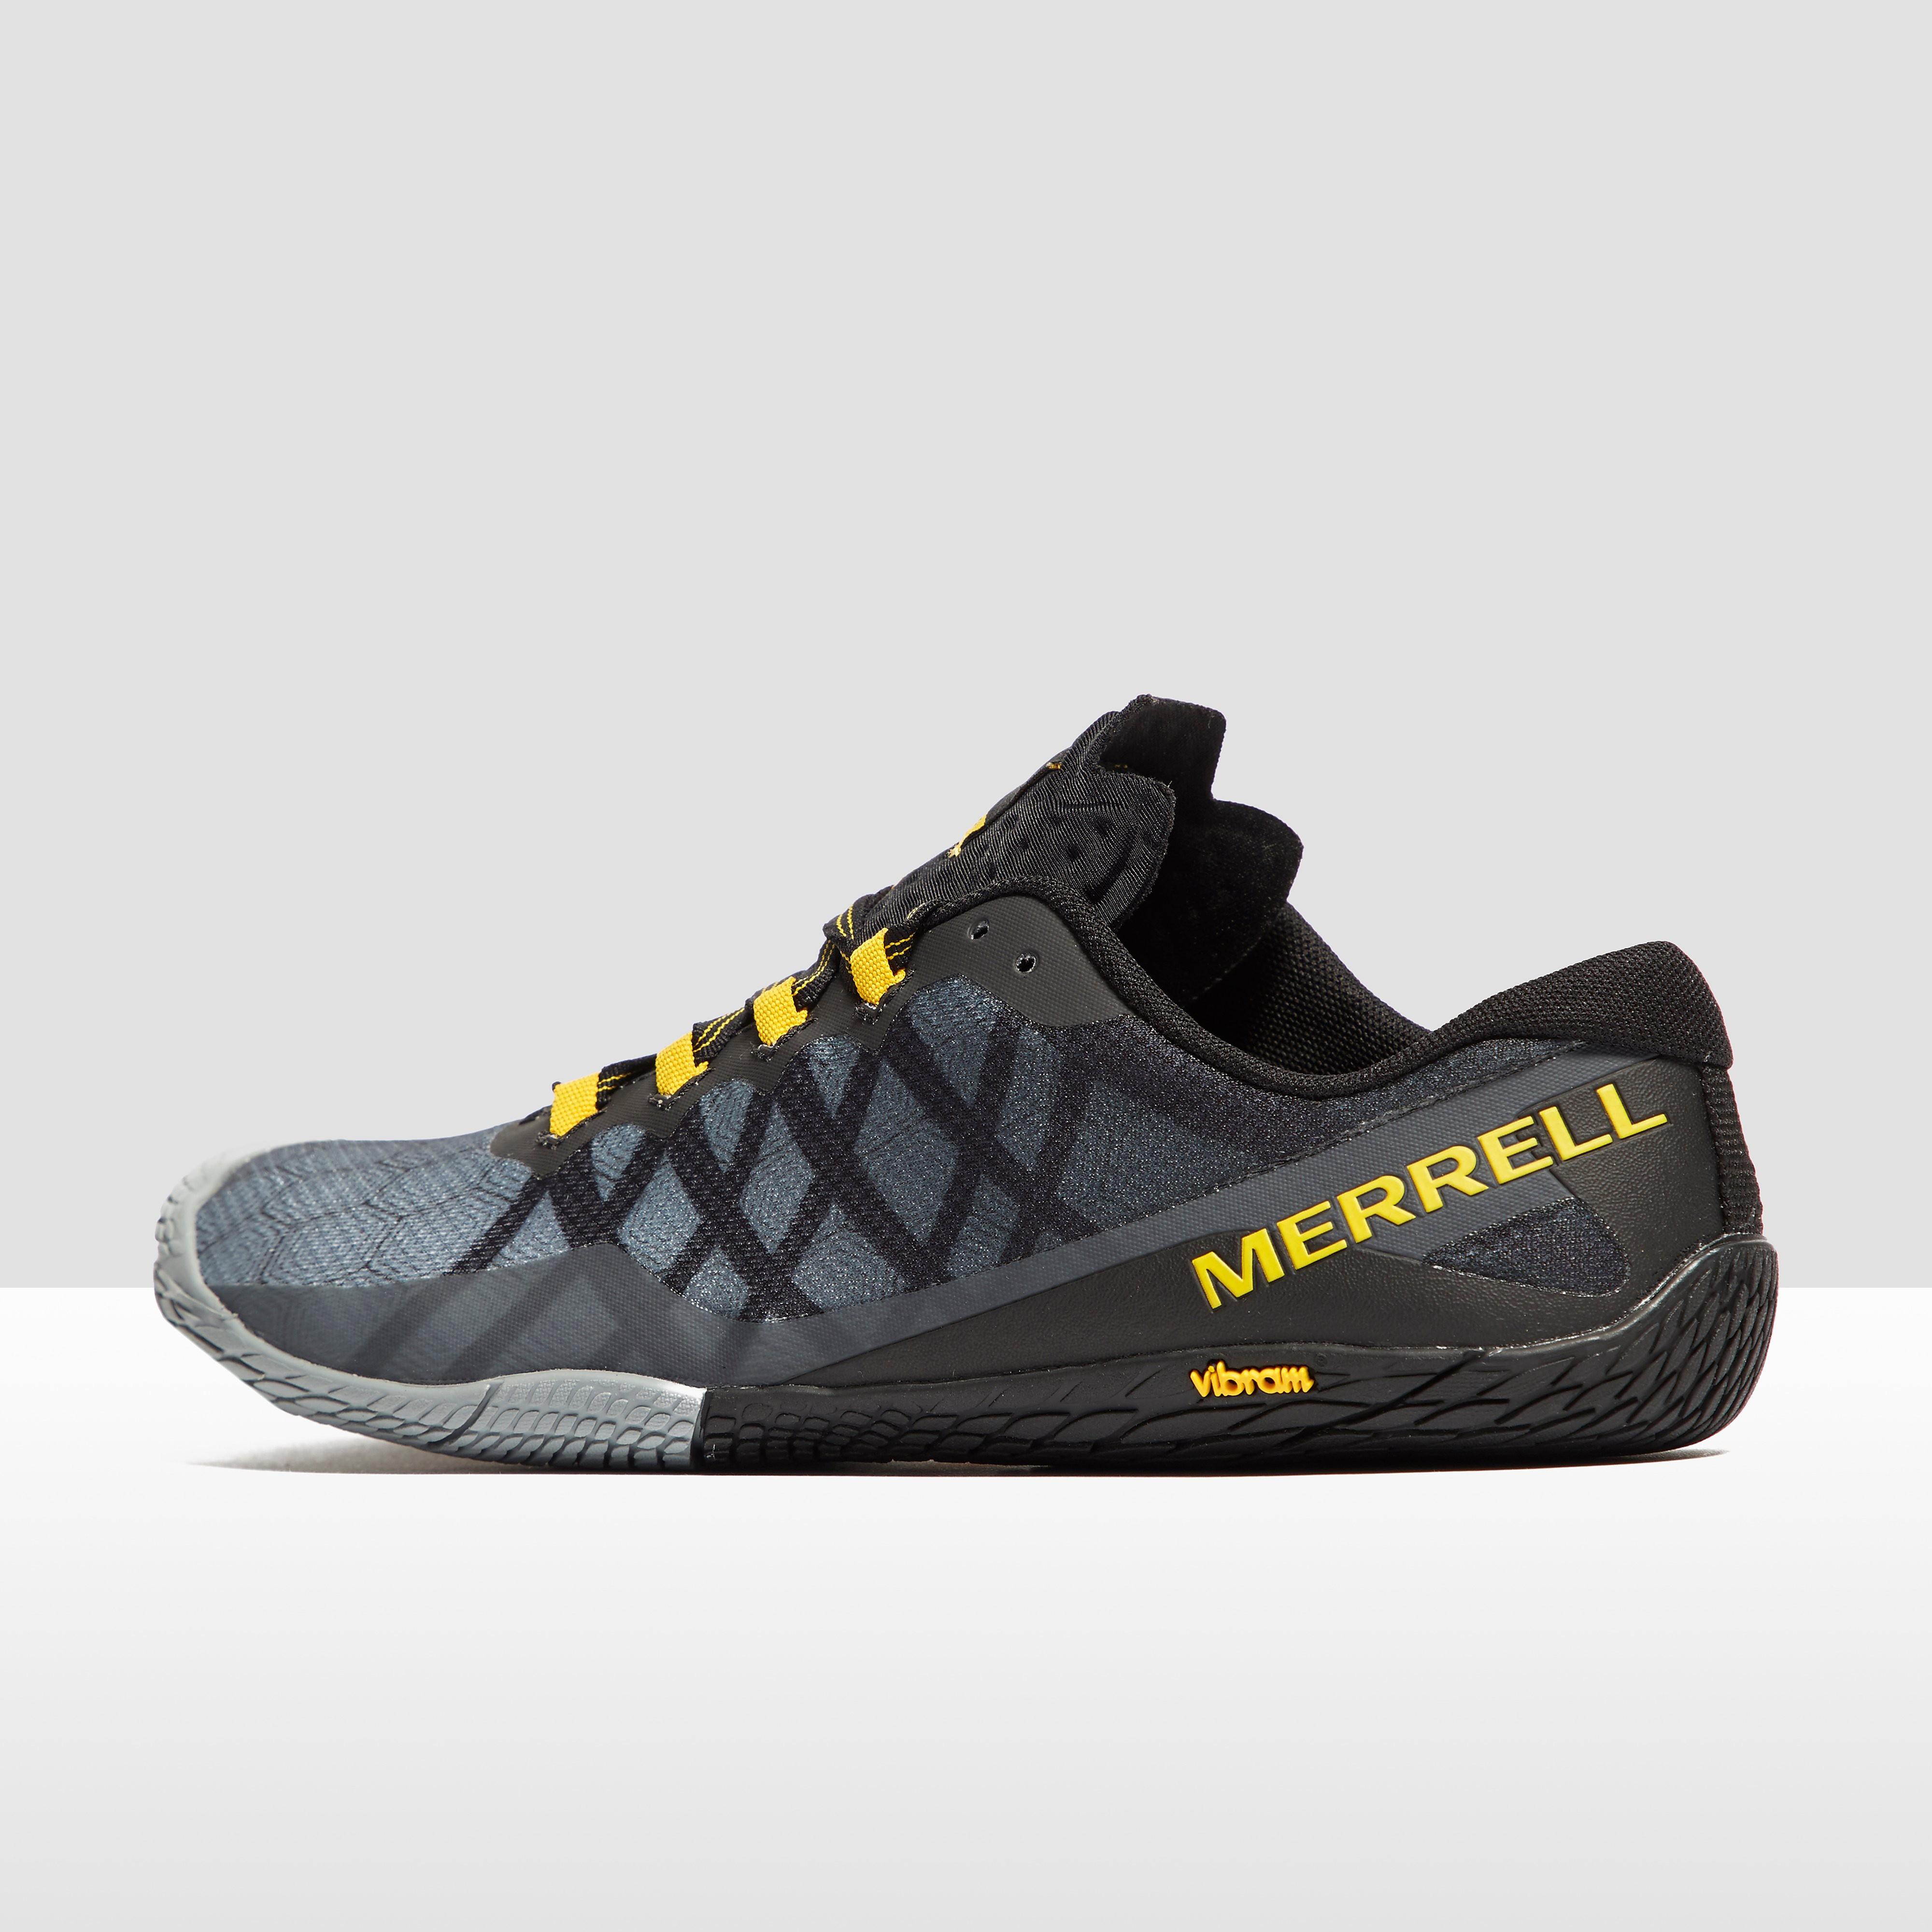 Merrell Vapour Glove 3 Men's Running Shoes